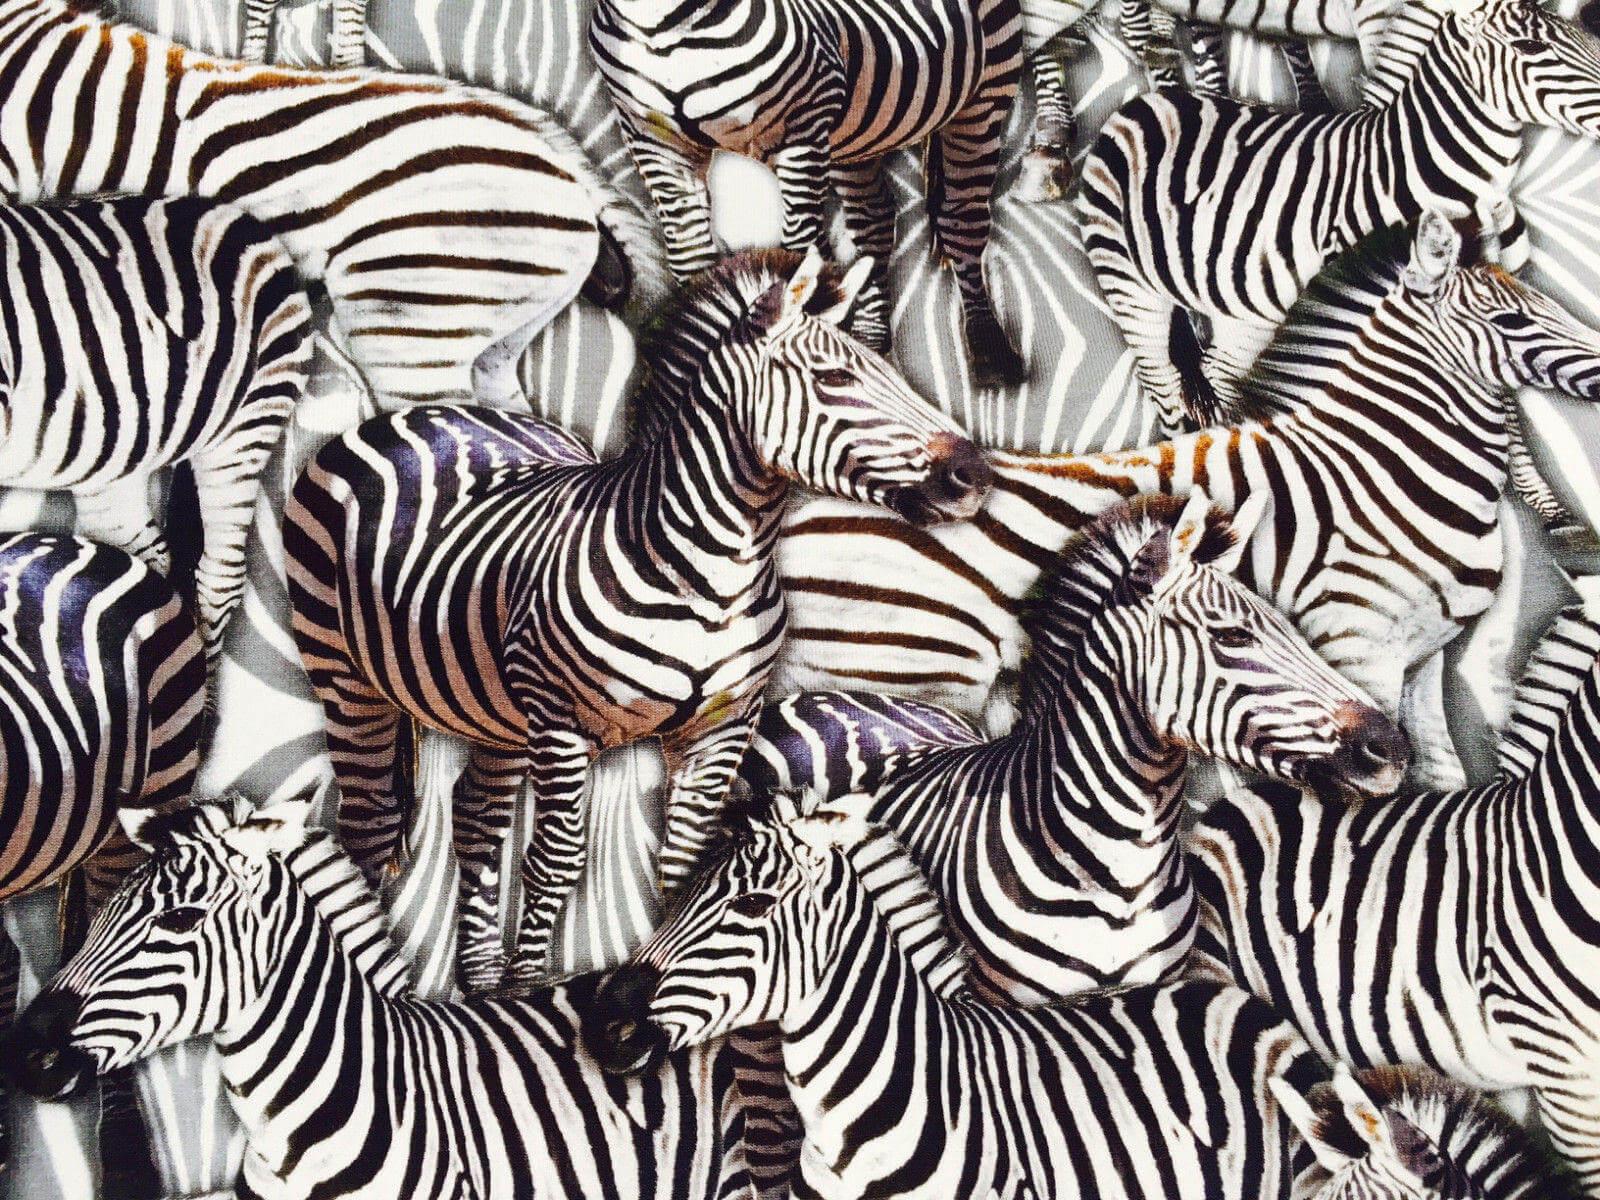 zebra-animal-print-fabric-4-way-stretch-elastane-spandex-lycra-stretch-knit-jersey-160cm-wide-black-white-zebras-5e248c501.jpg